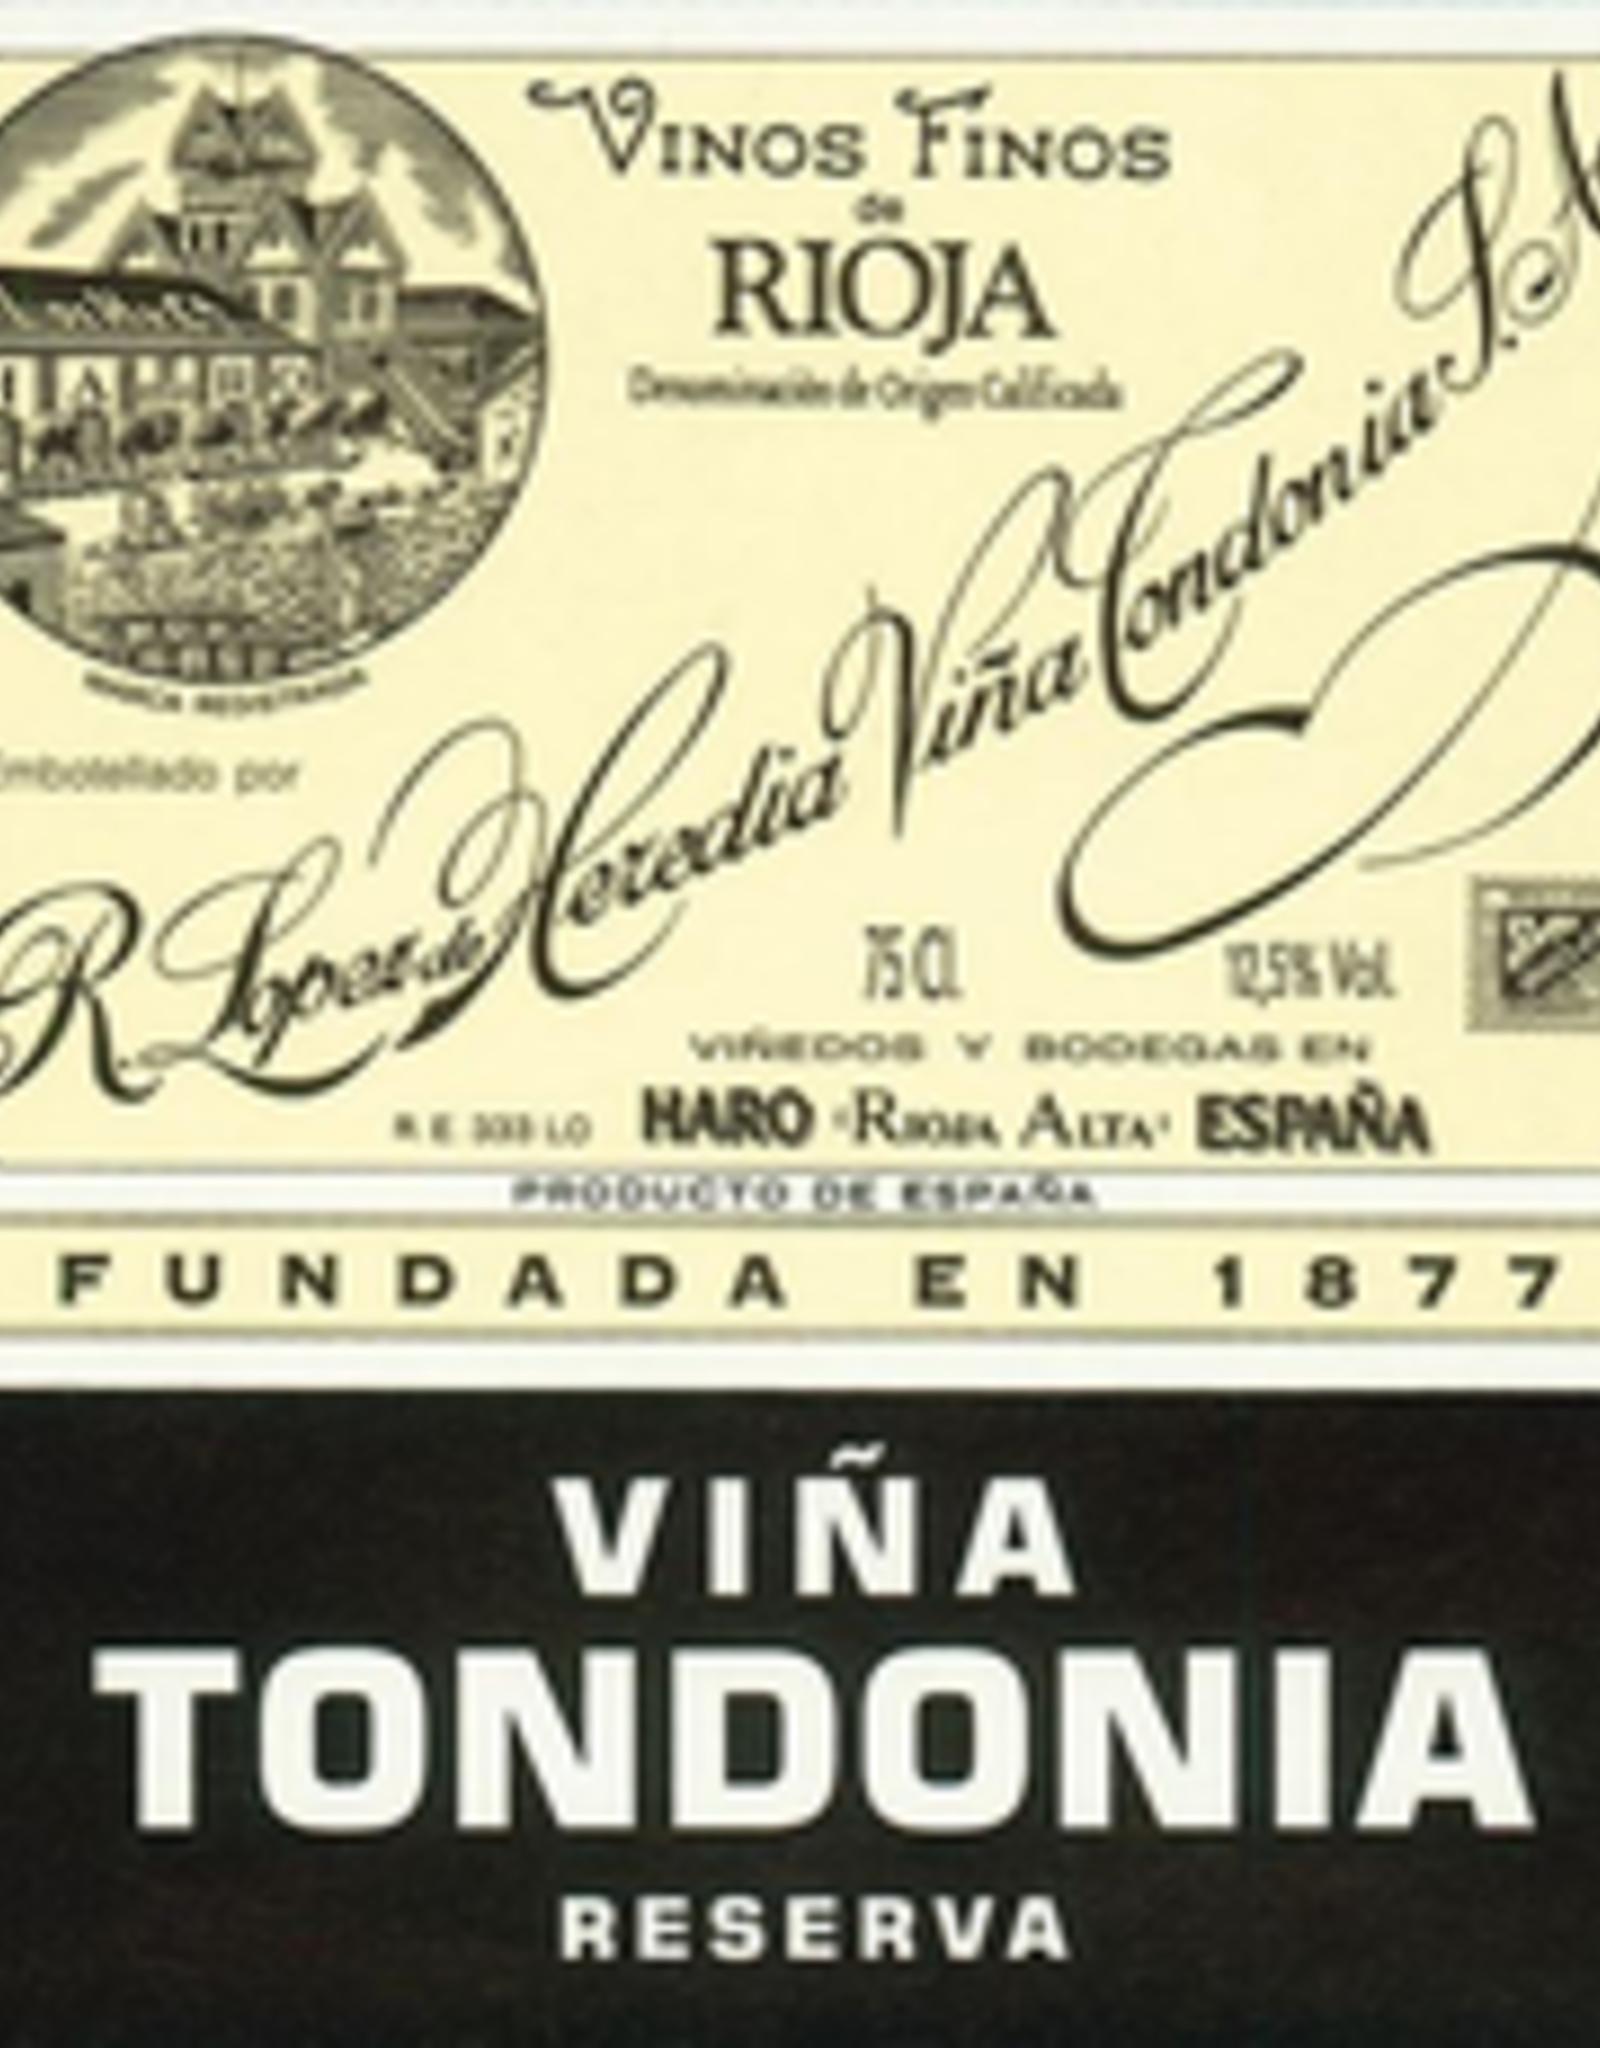 Rioja Reserva, VINA TONDONIA, Lopez de Heredia 2008